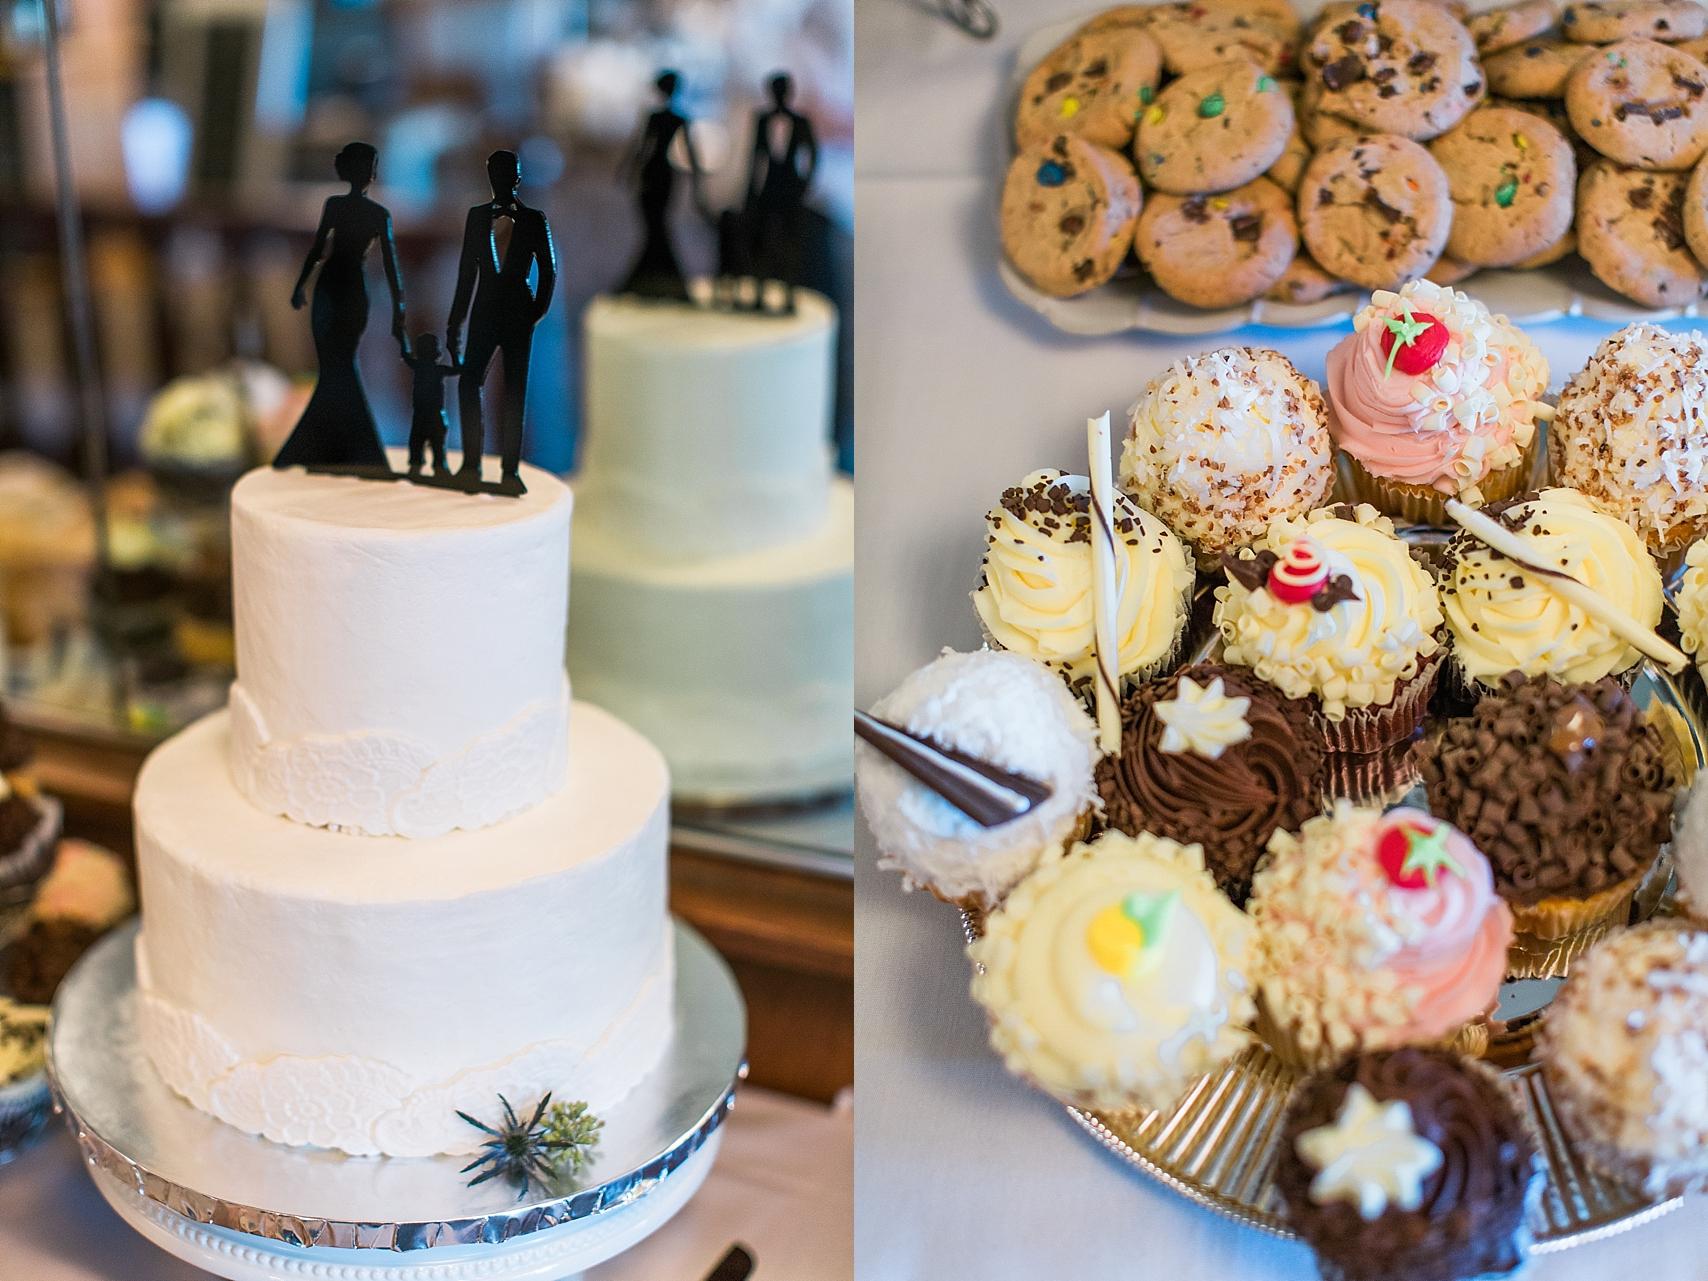 Reception space cake and dessert at the Chart House Summer Wedding Lakeville Minnesota Minneapolis Wedding Photographer Mallory Kiesow